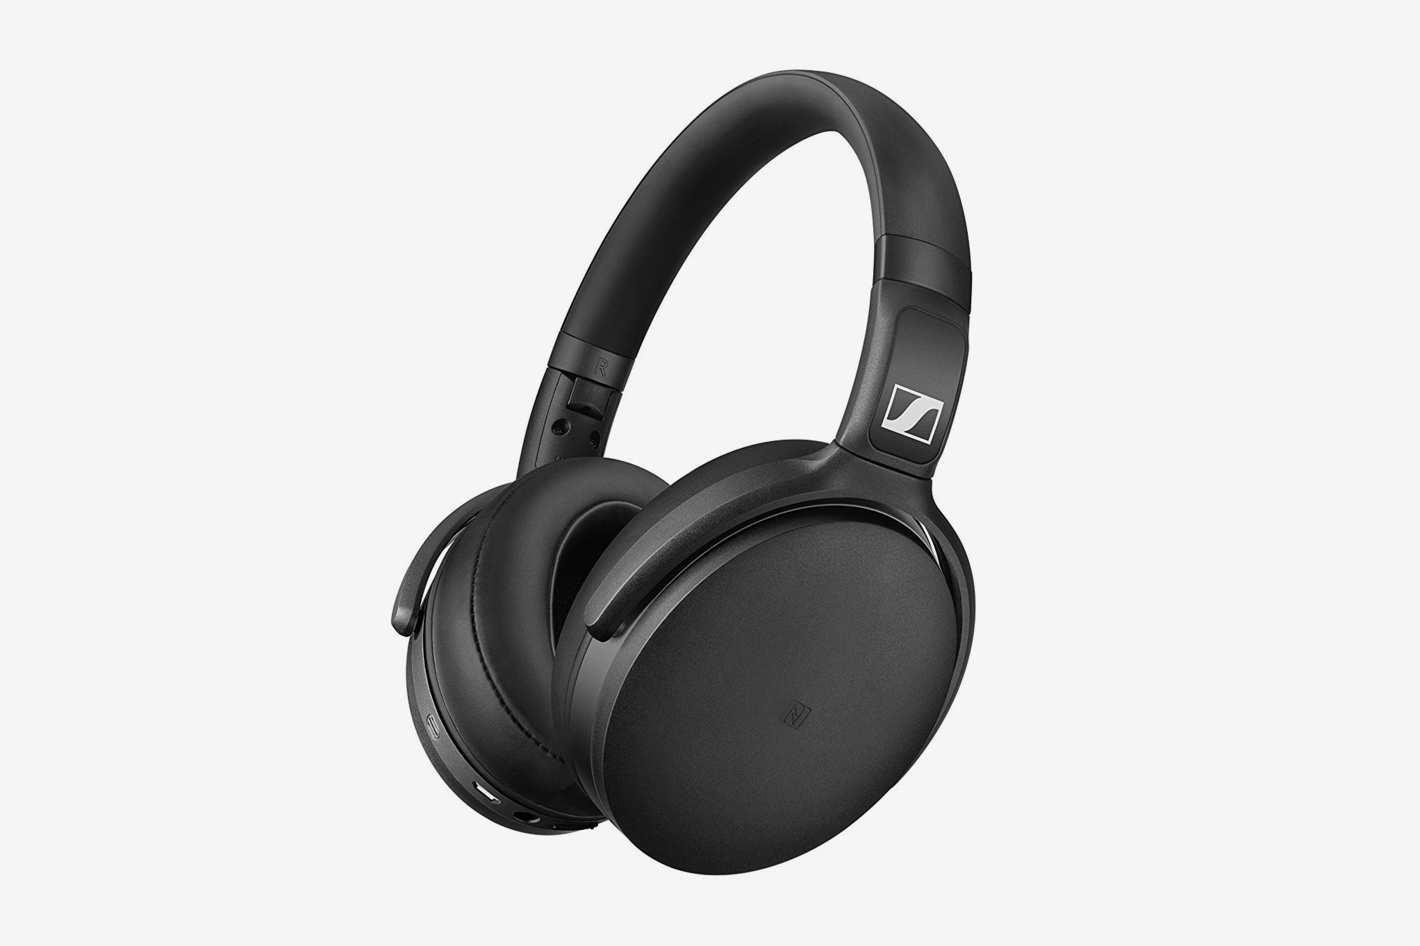 Sennheiser HD 4.50 SE Wireless Noise Cancelling Headphones.